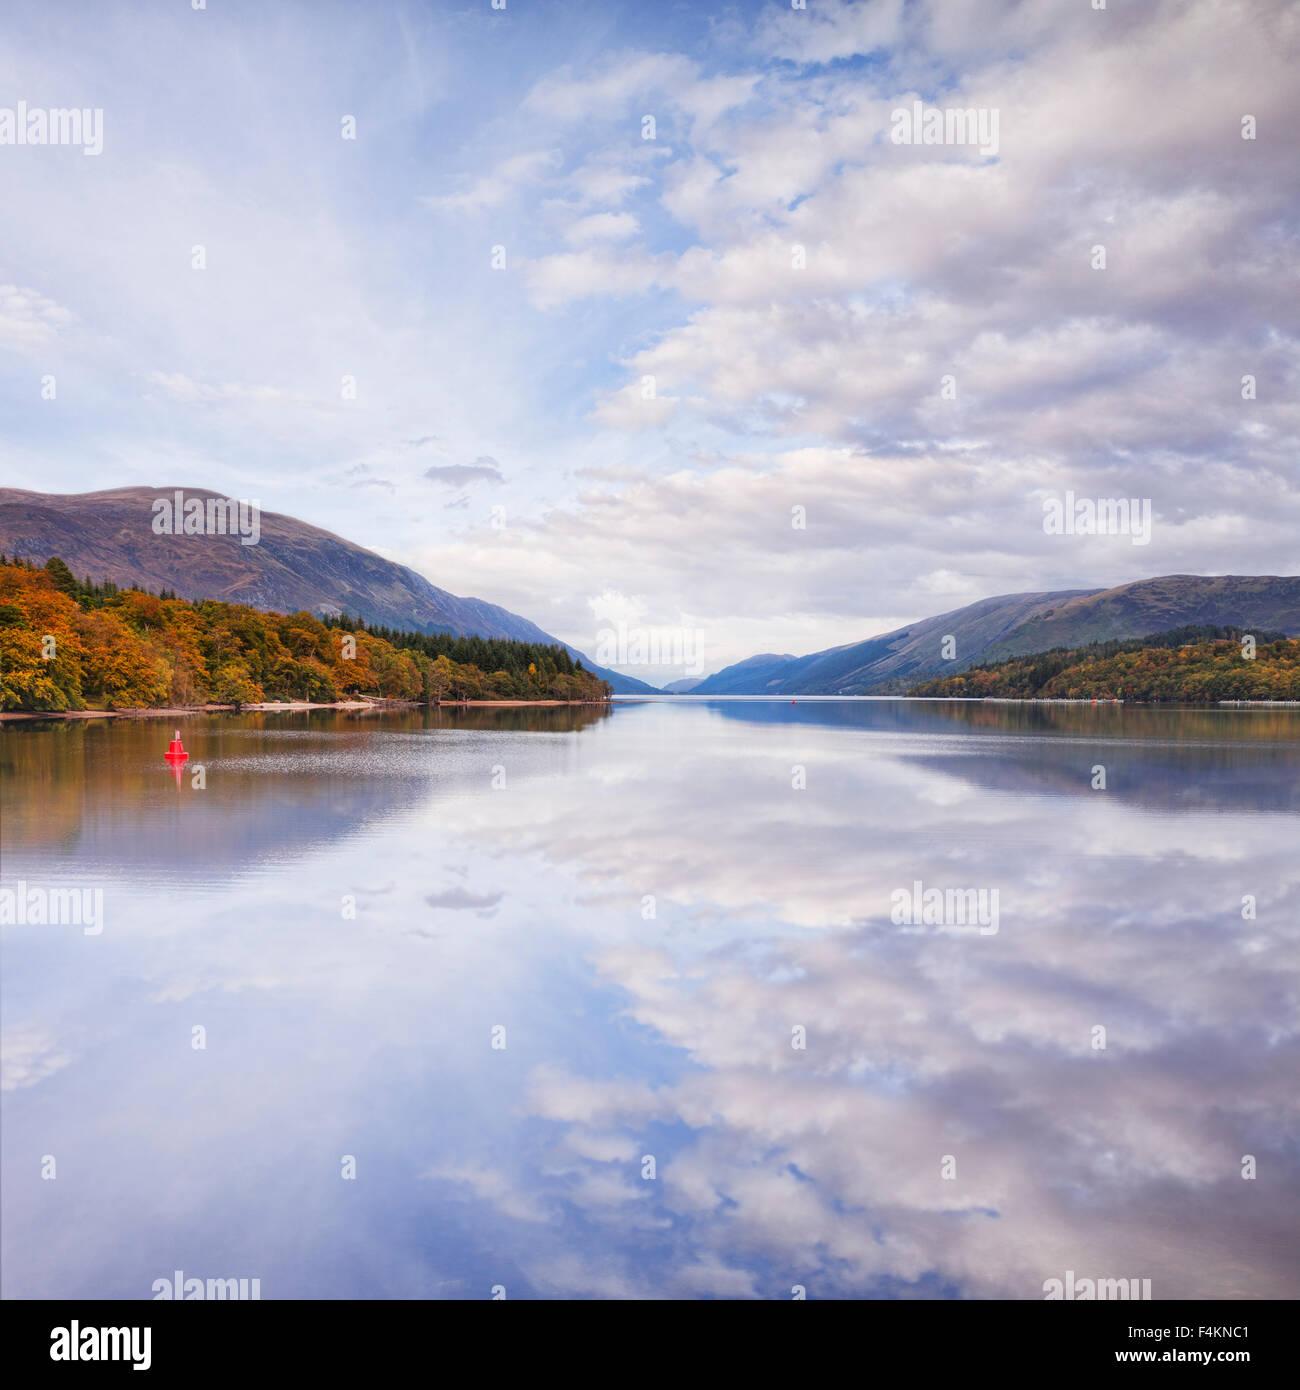 L'automne, Loch Lochy, Highland, en Écosse. UK Photo Stock